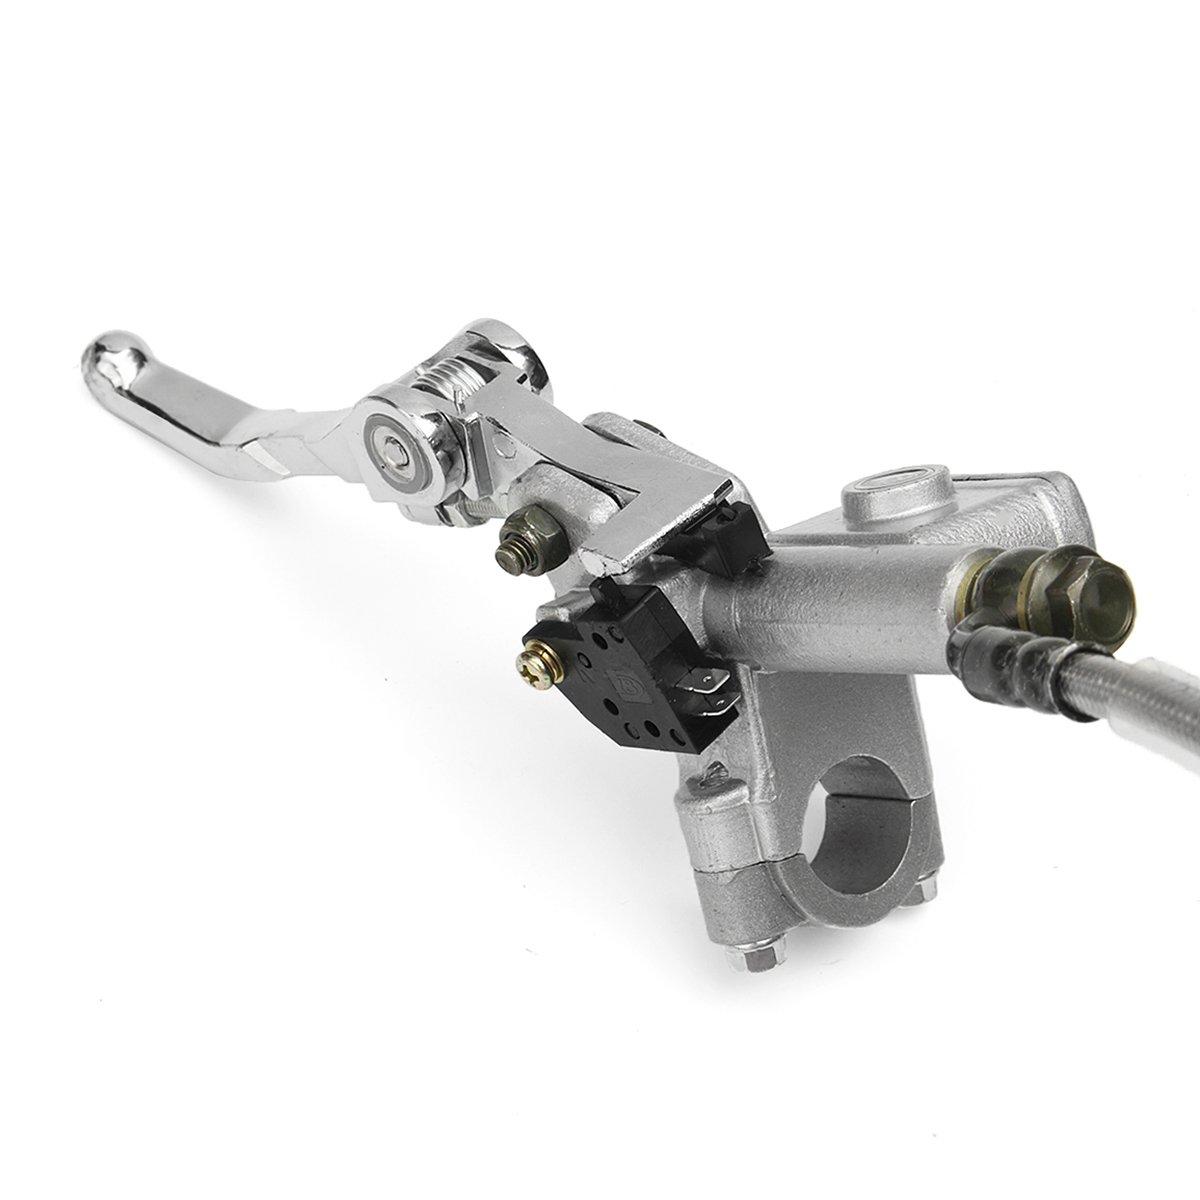 Alamor Universal Frente Hidr/áulico Freno Pinza Disco 125Cc 150Cc Pit Dirt Bike Kit Conjunto